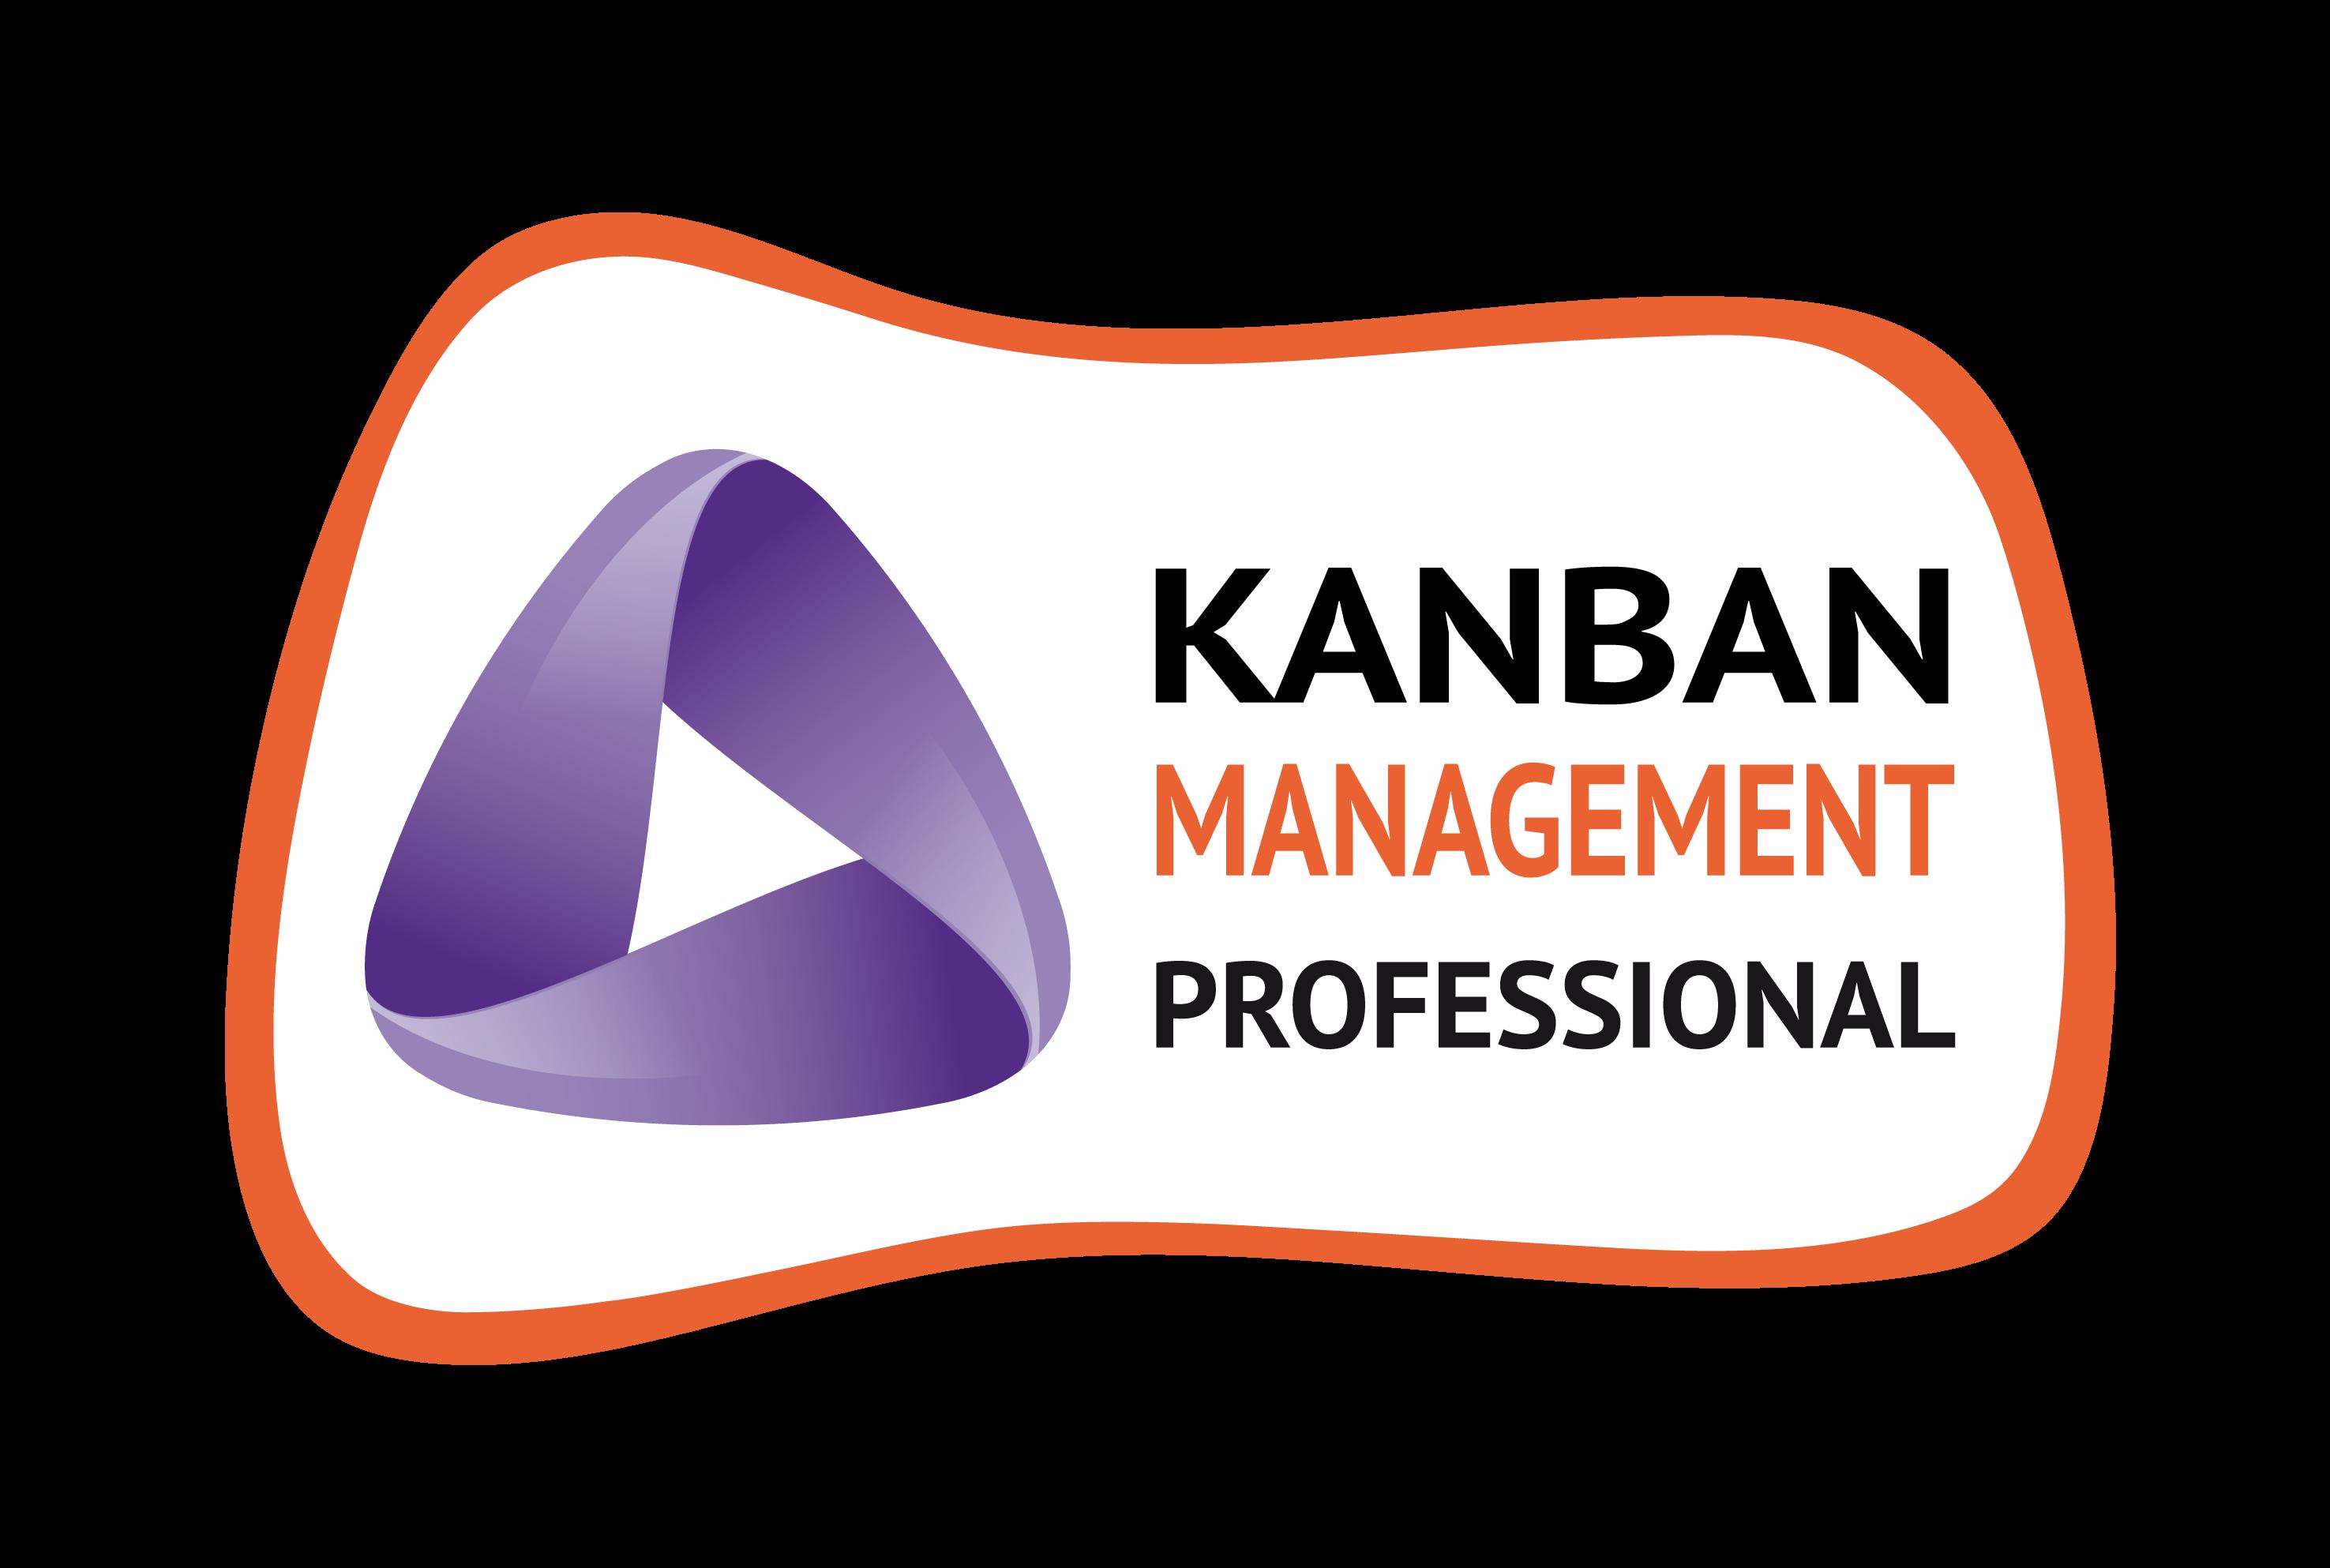 Kanban Management Professional (KMP)